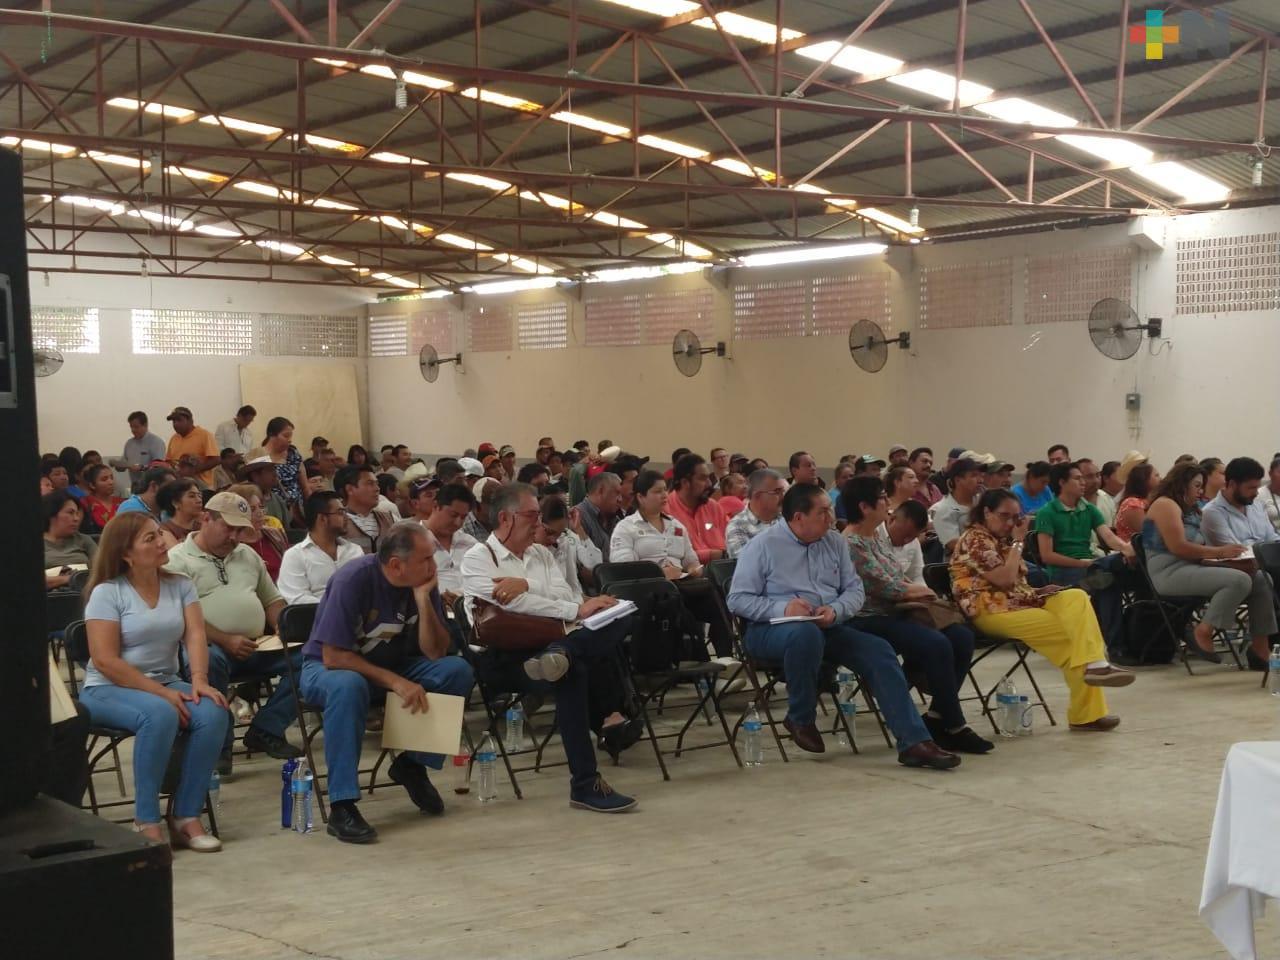 Realizan en Veracruz primera consulta pública sobre Corredor Transístmico